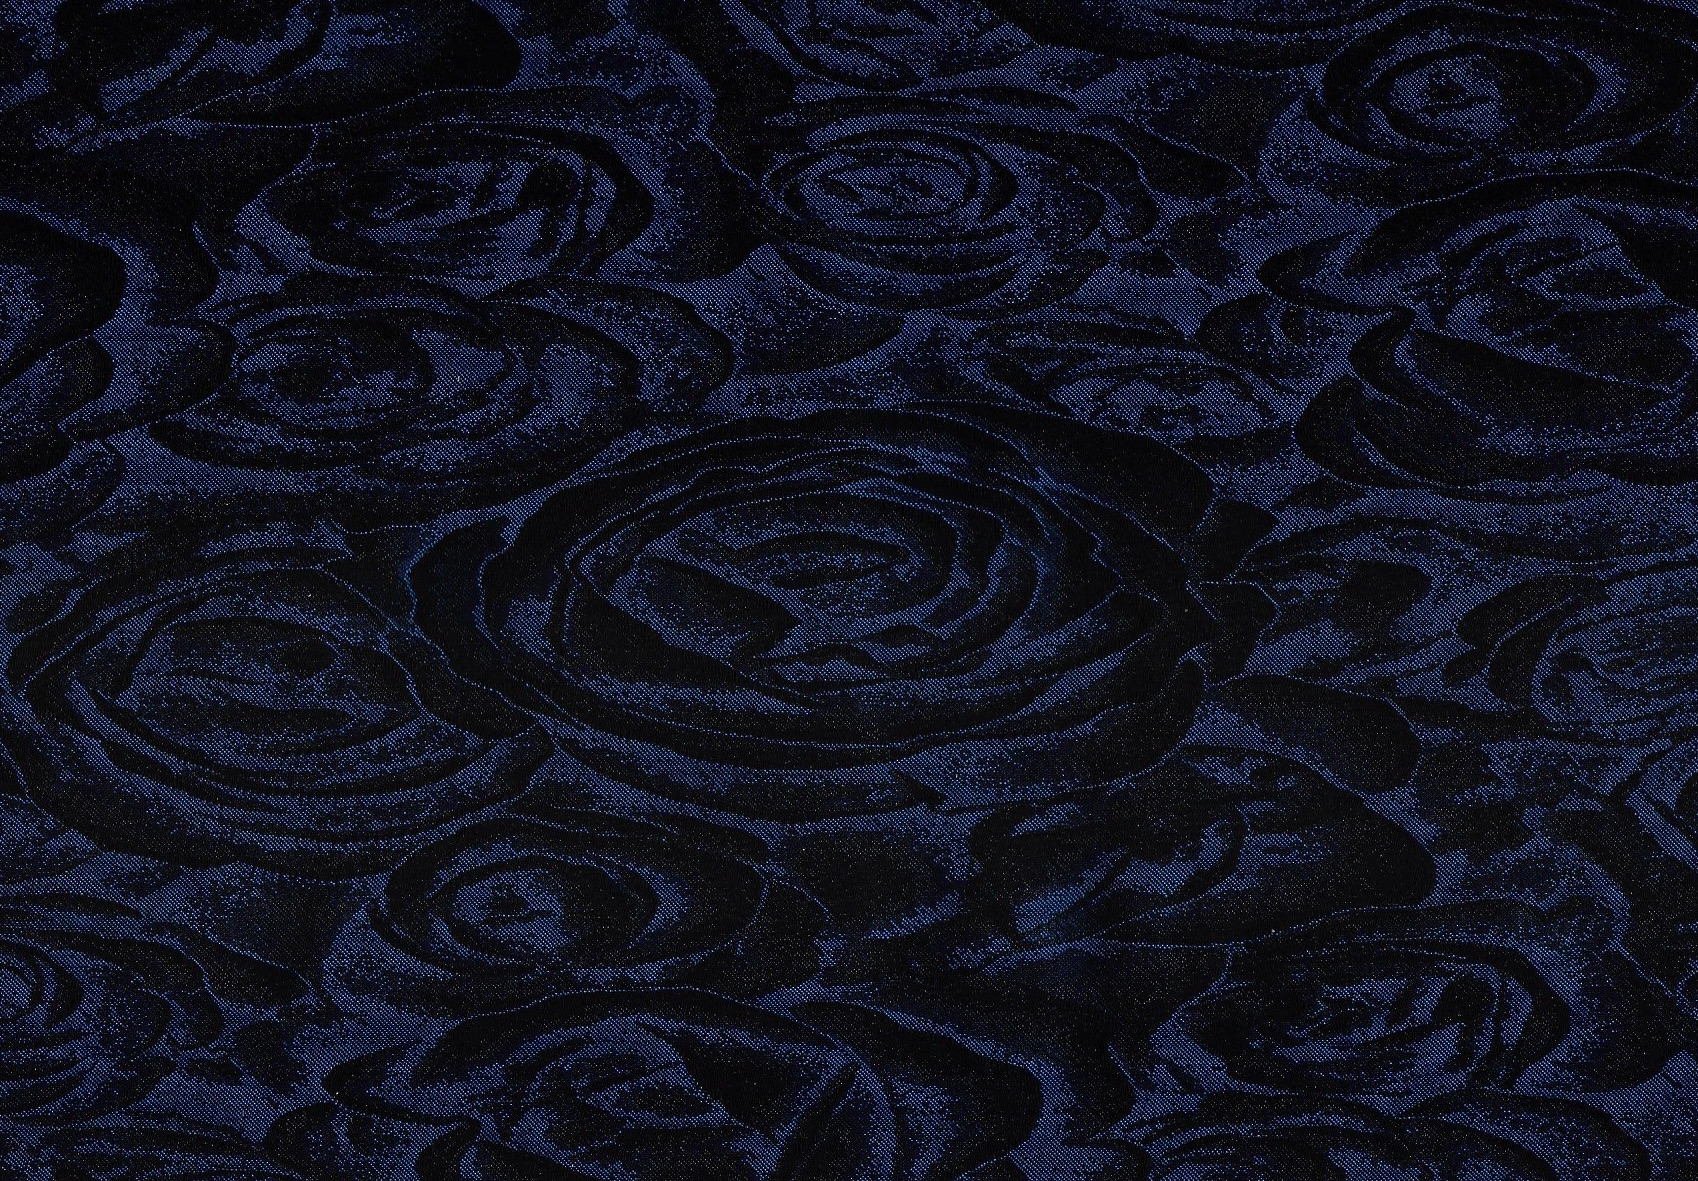 fran rose blue.jpg